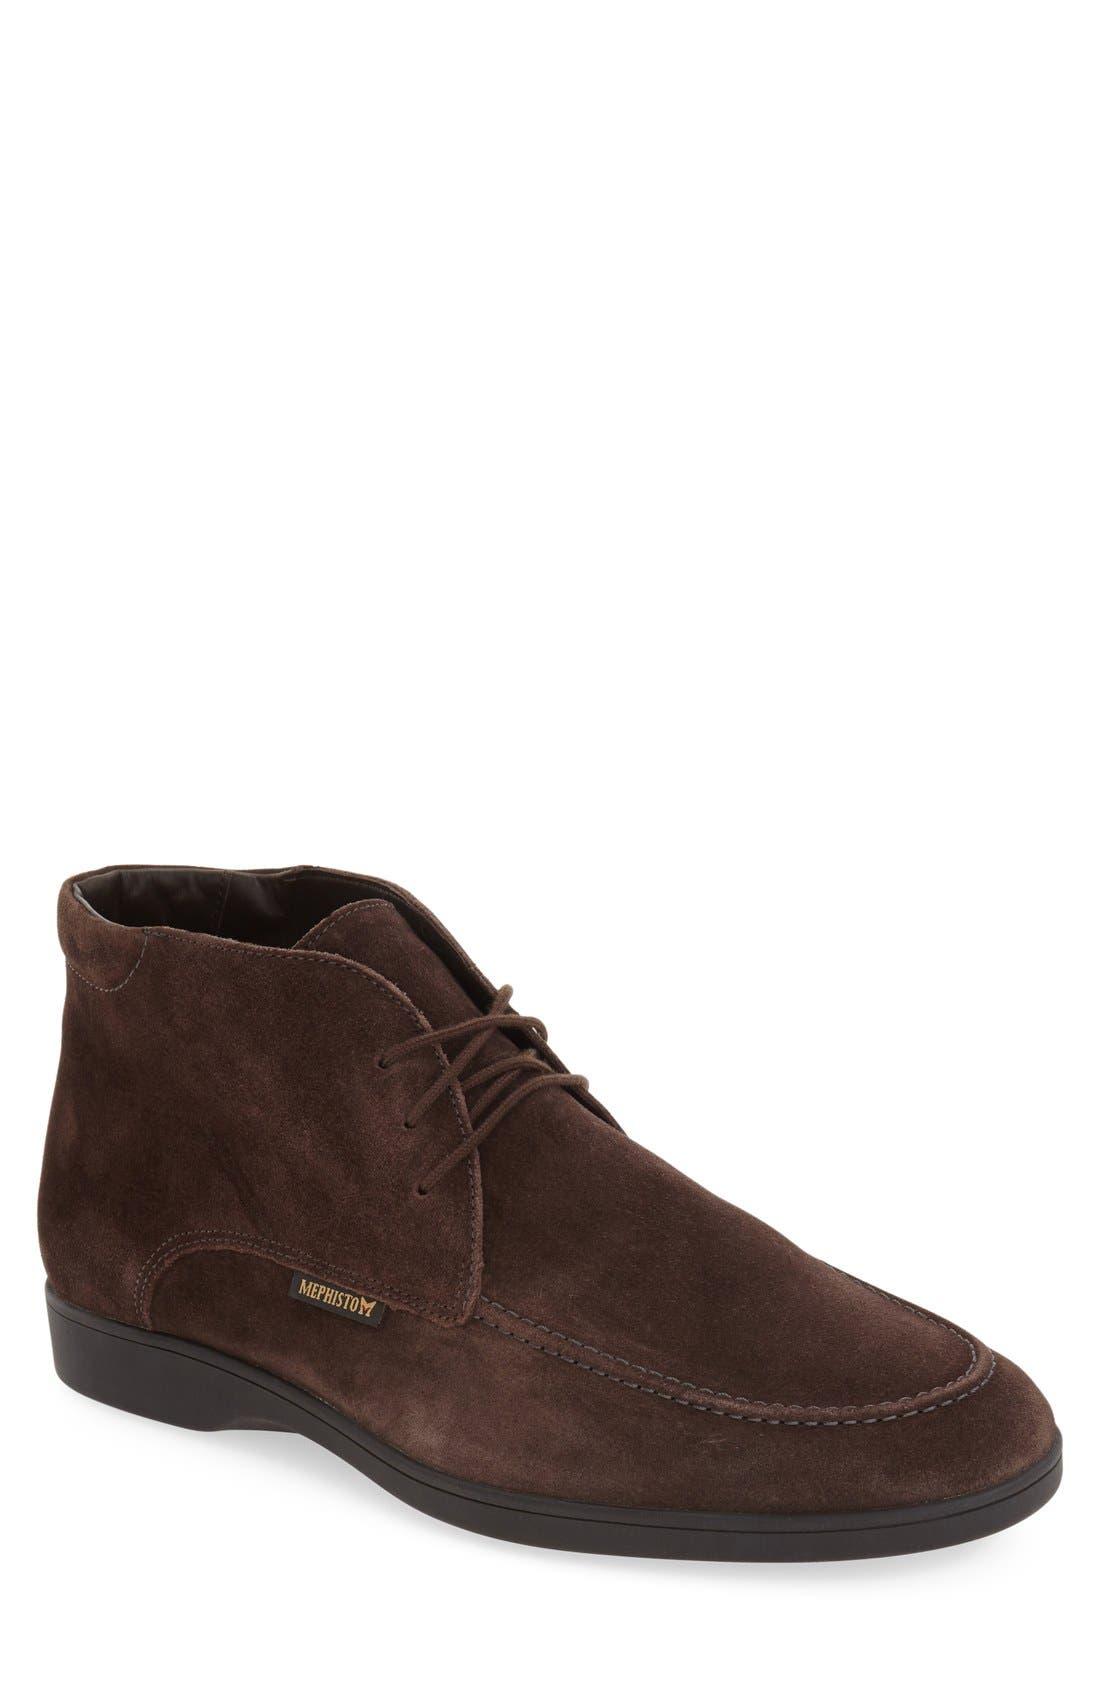 'Stelio' Chukka Boot,                         Main,                         color, 202